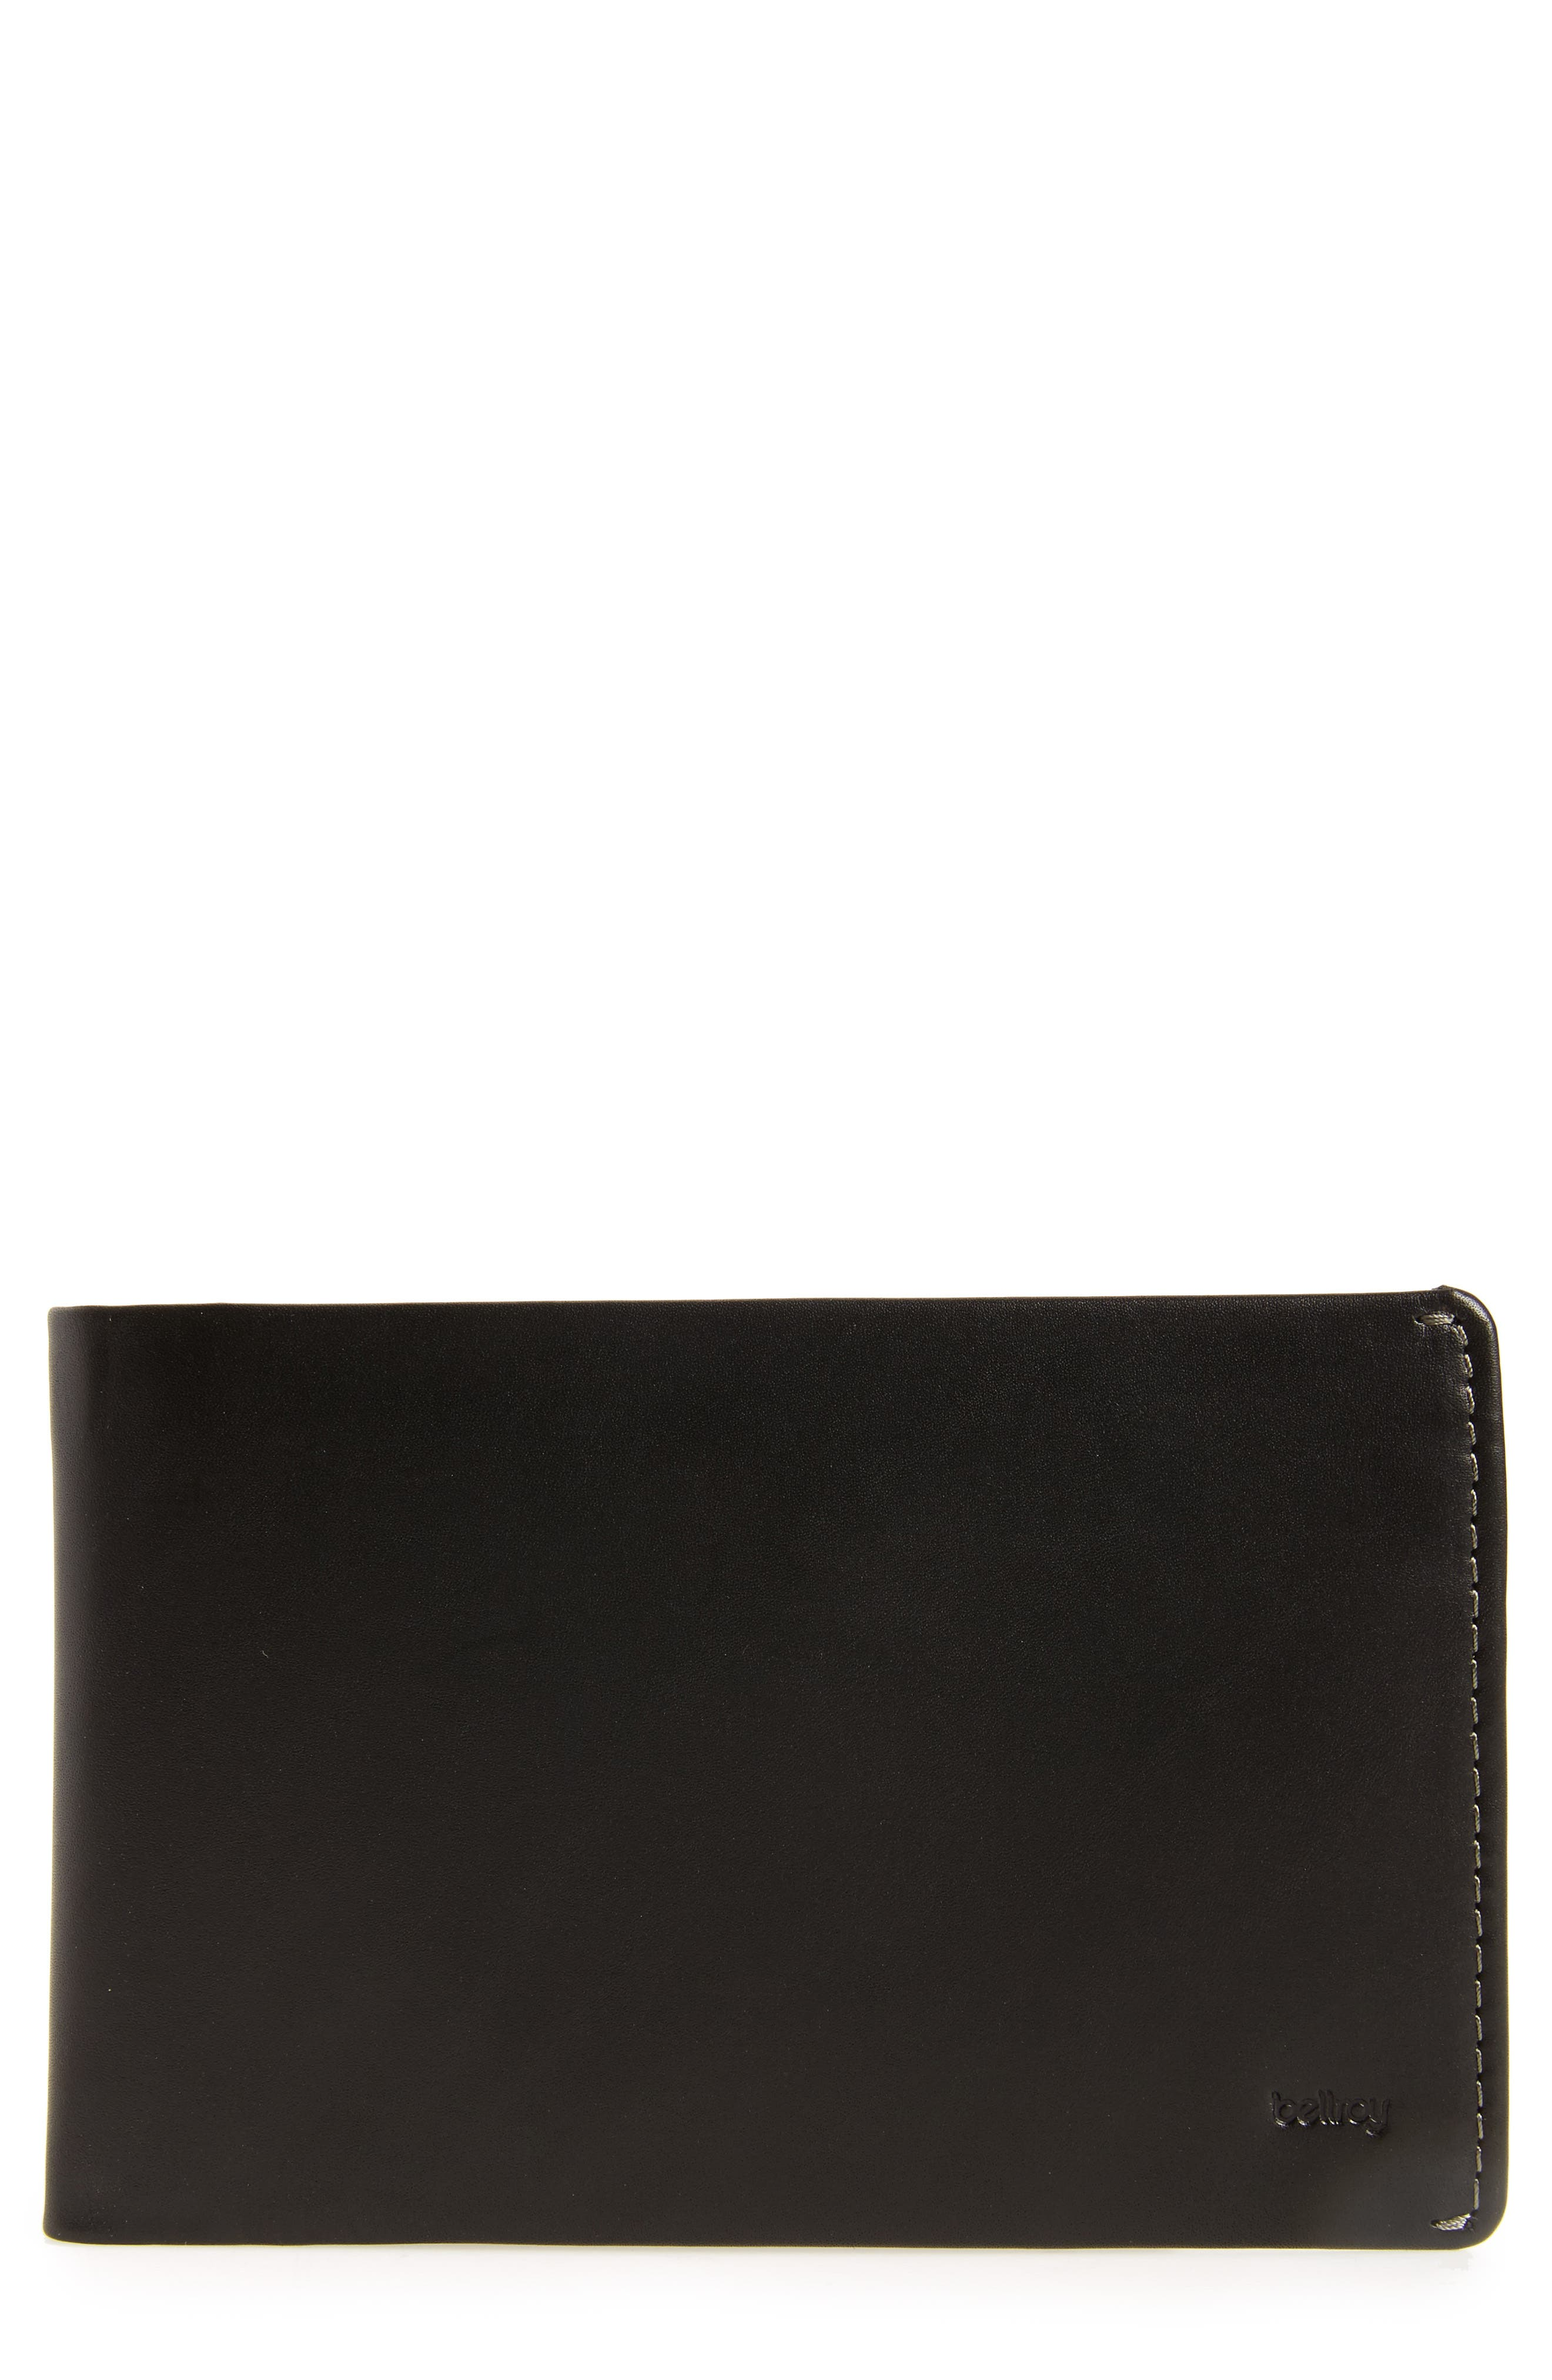 RFID Travel Wallet,                         Main,                         color, Black